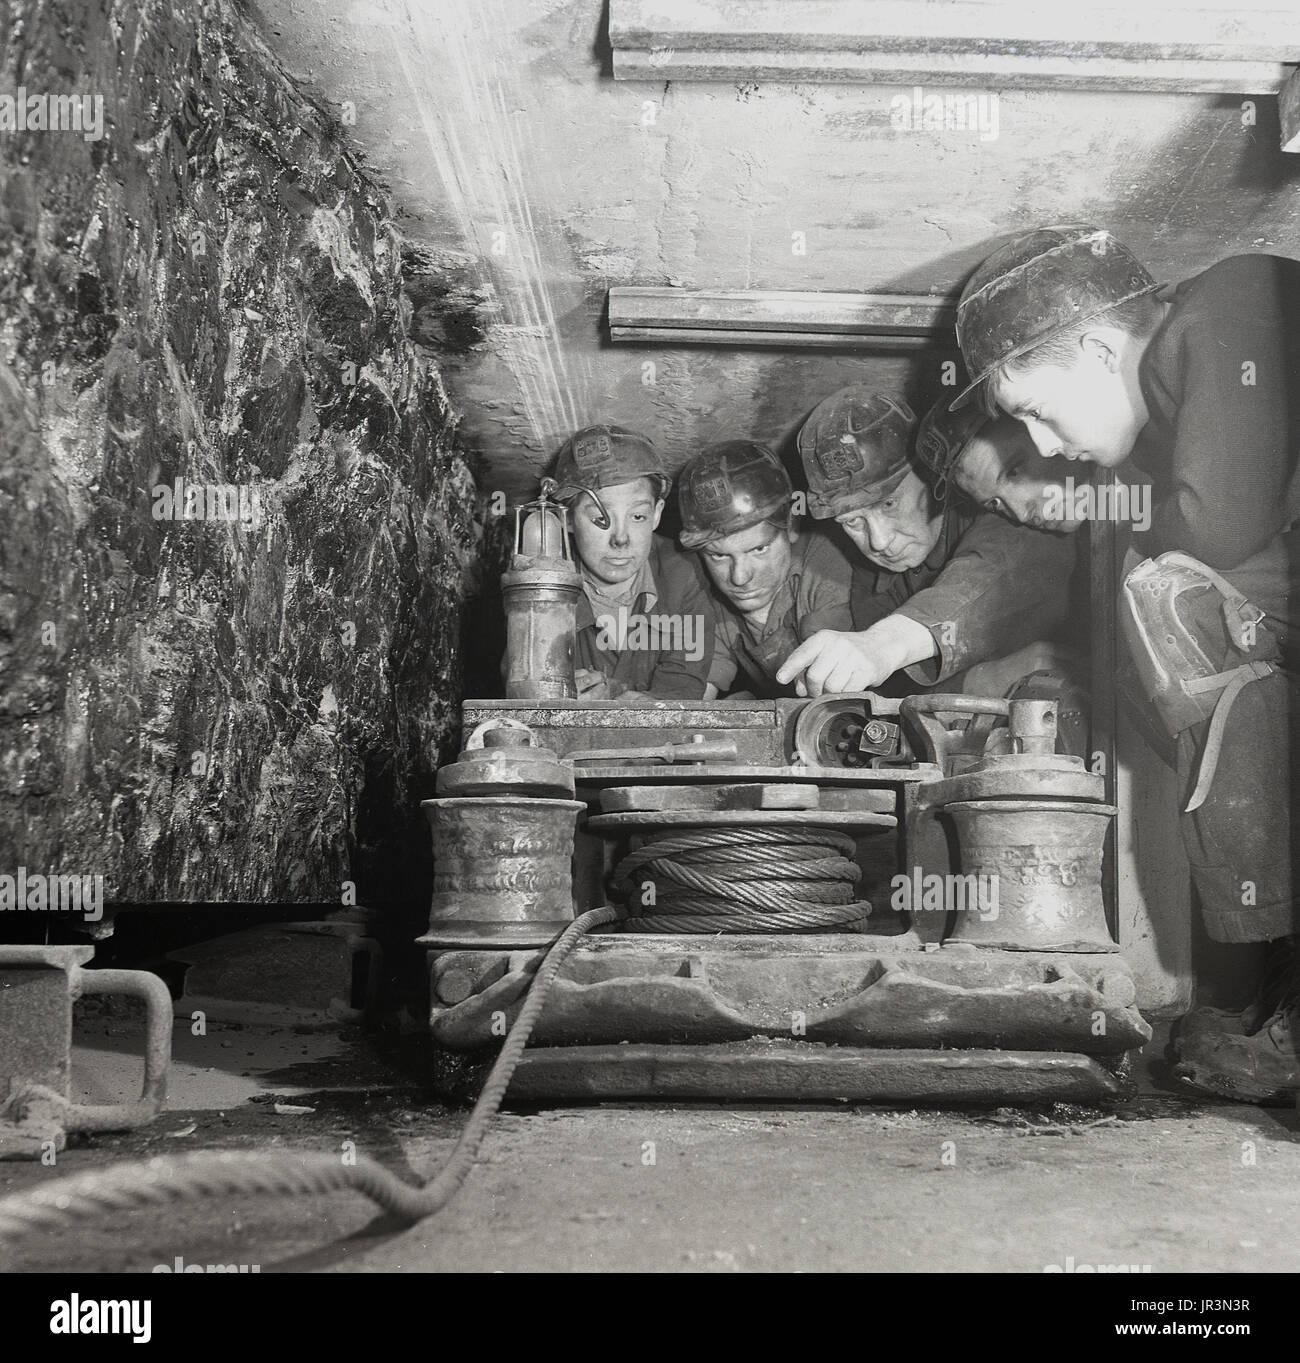 coal mining miners stockfotos coal mining miners bilder. Black Bedroom Furniture Sets. Home Design Ideas